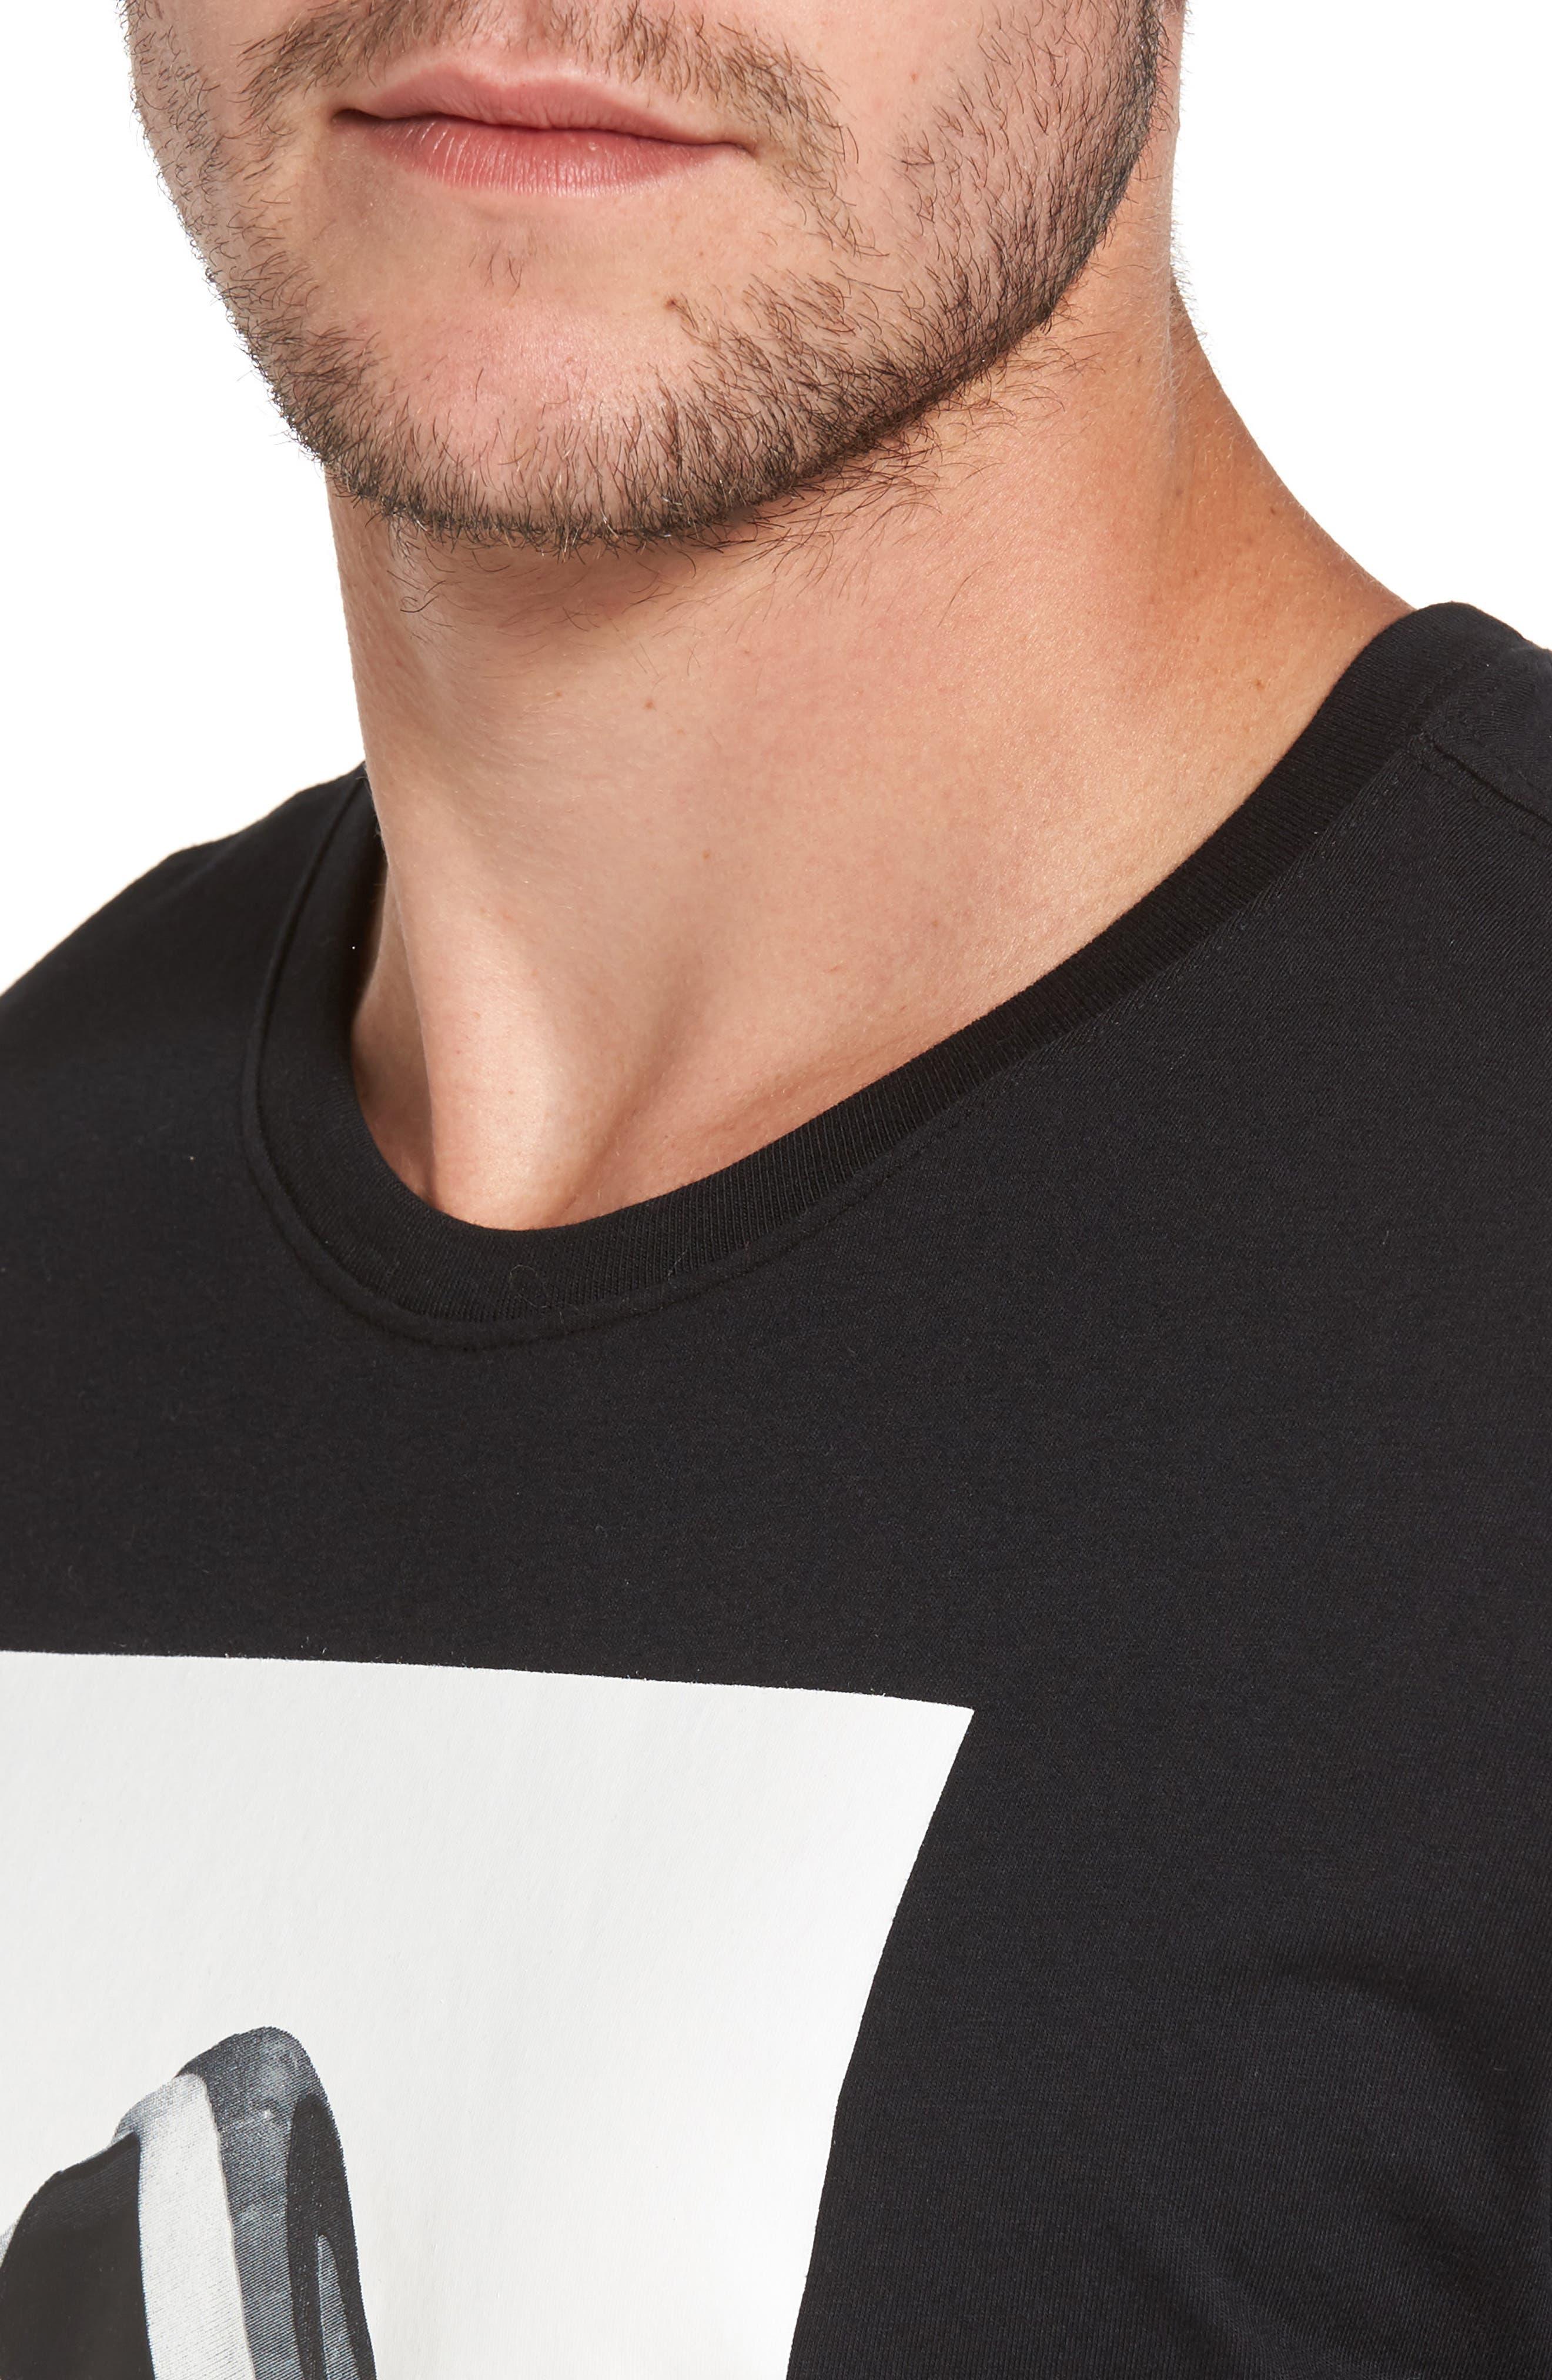 Sportswear AJ11 CNXN Graphic T-Shirt,                             Alternate thumbnail 4, color,                             010